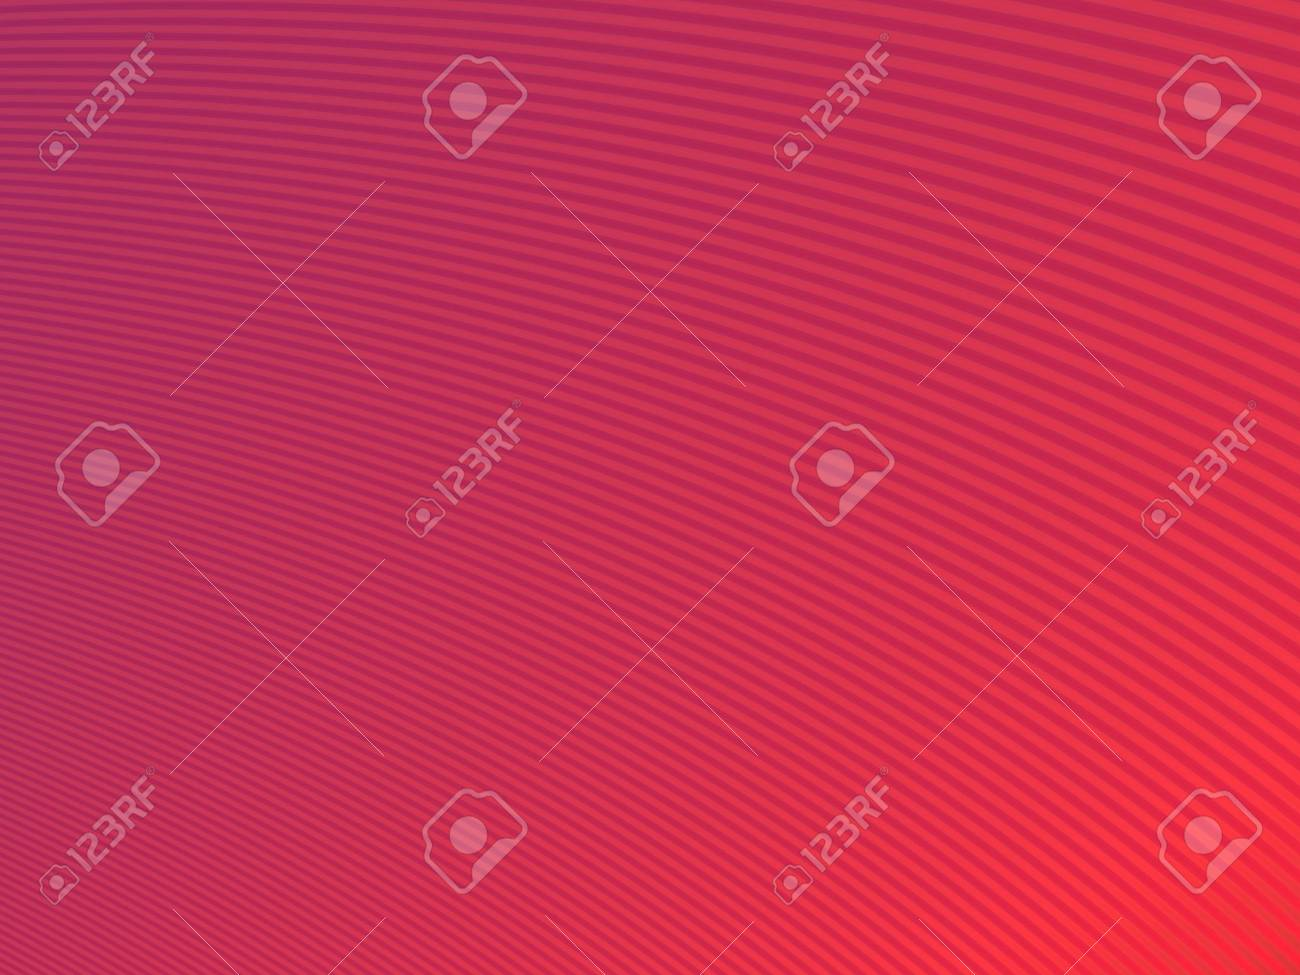 Fractal rendition of pink flower petal back ground Stock Photo - 1326880